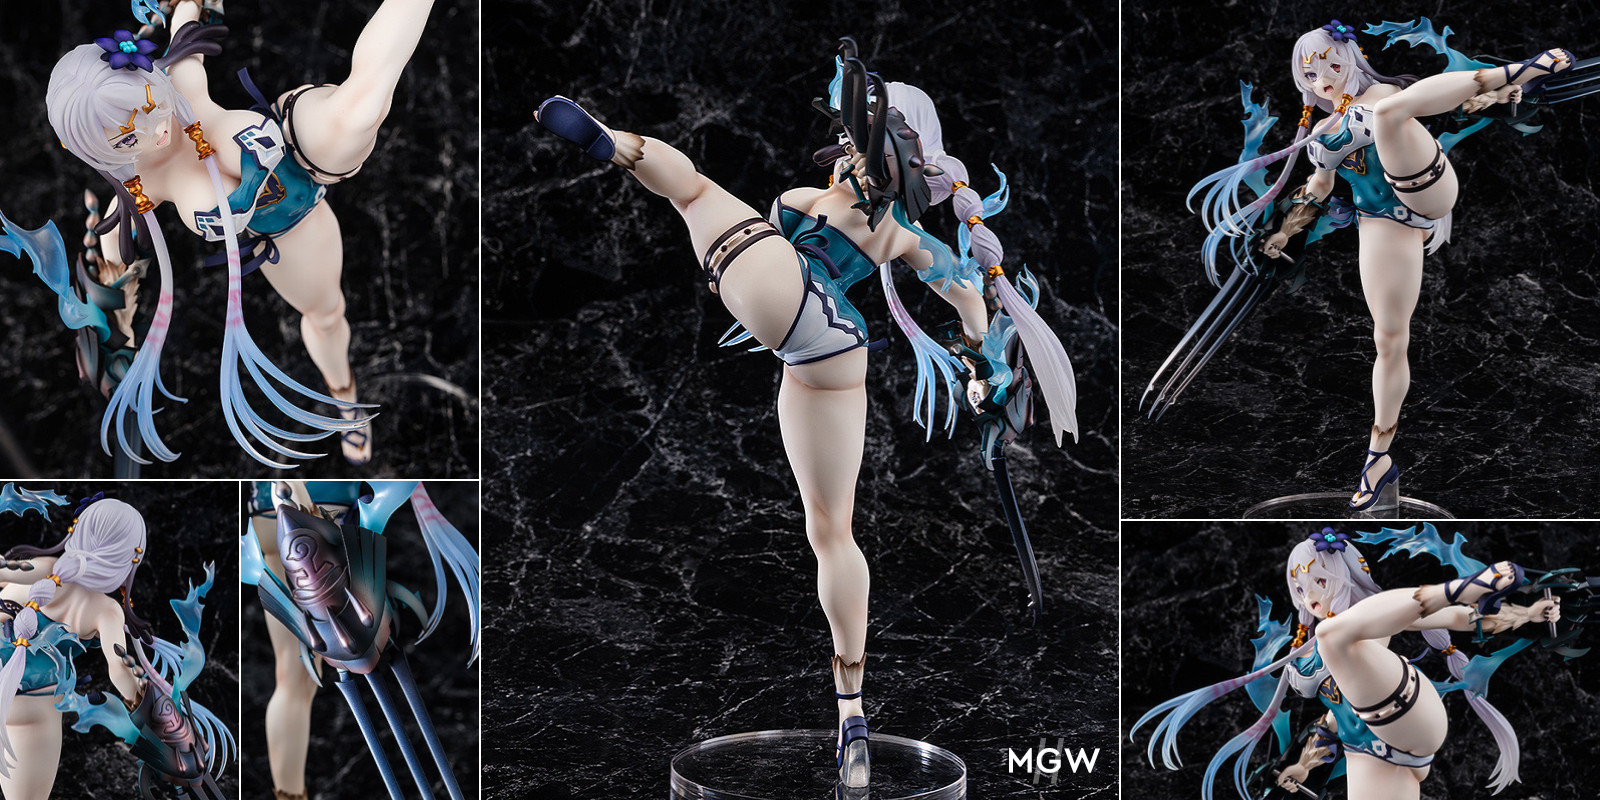 Lila Swimsuit Ver. by Wonderful Works from Atelier Ryza MyGrailWatch Anime Figure Guide